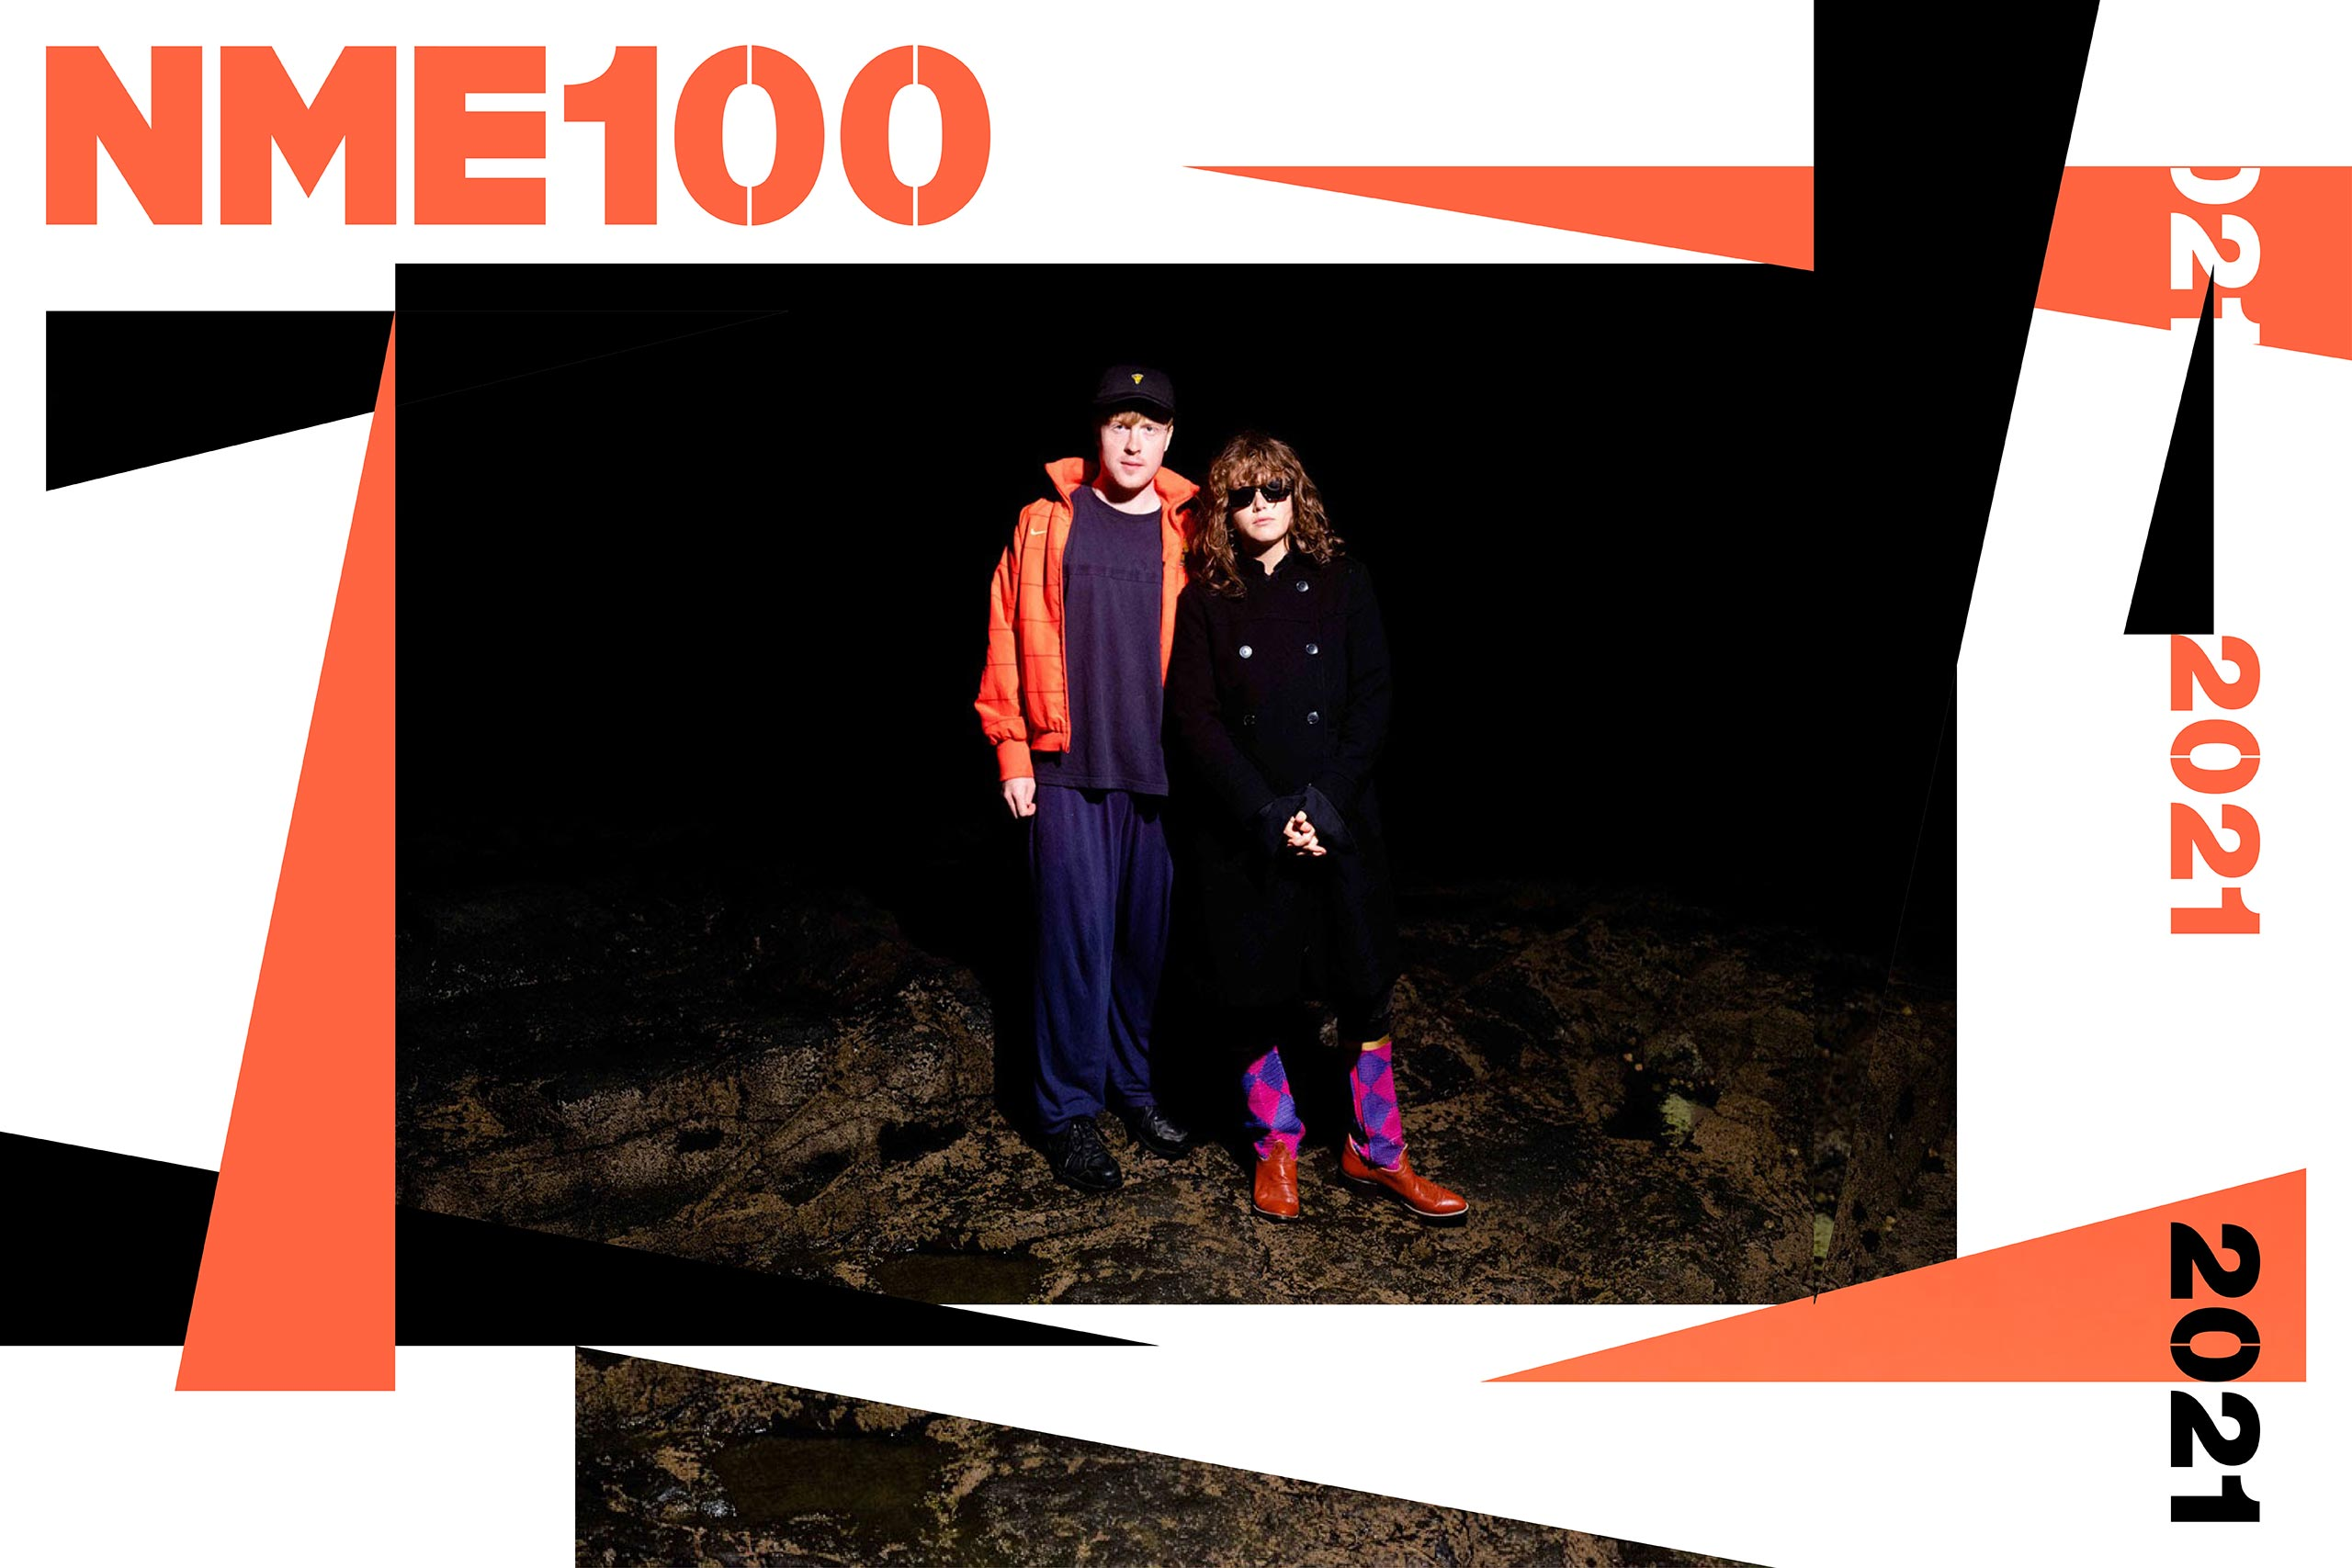 NME 100 jockstrap